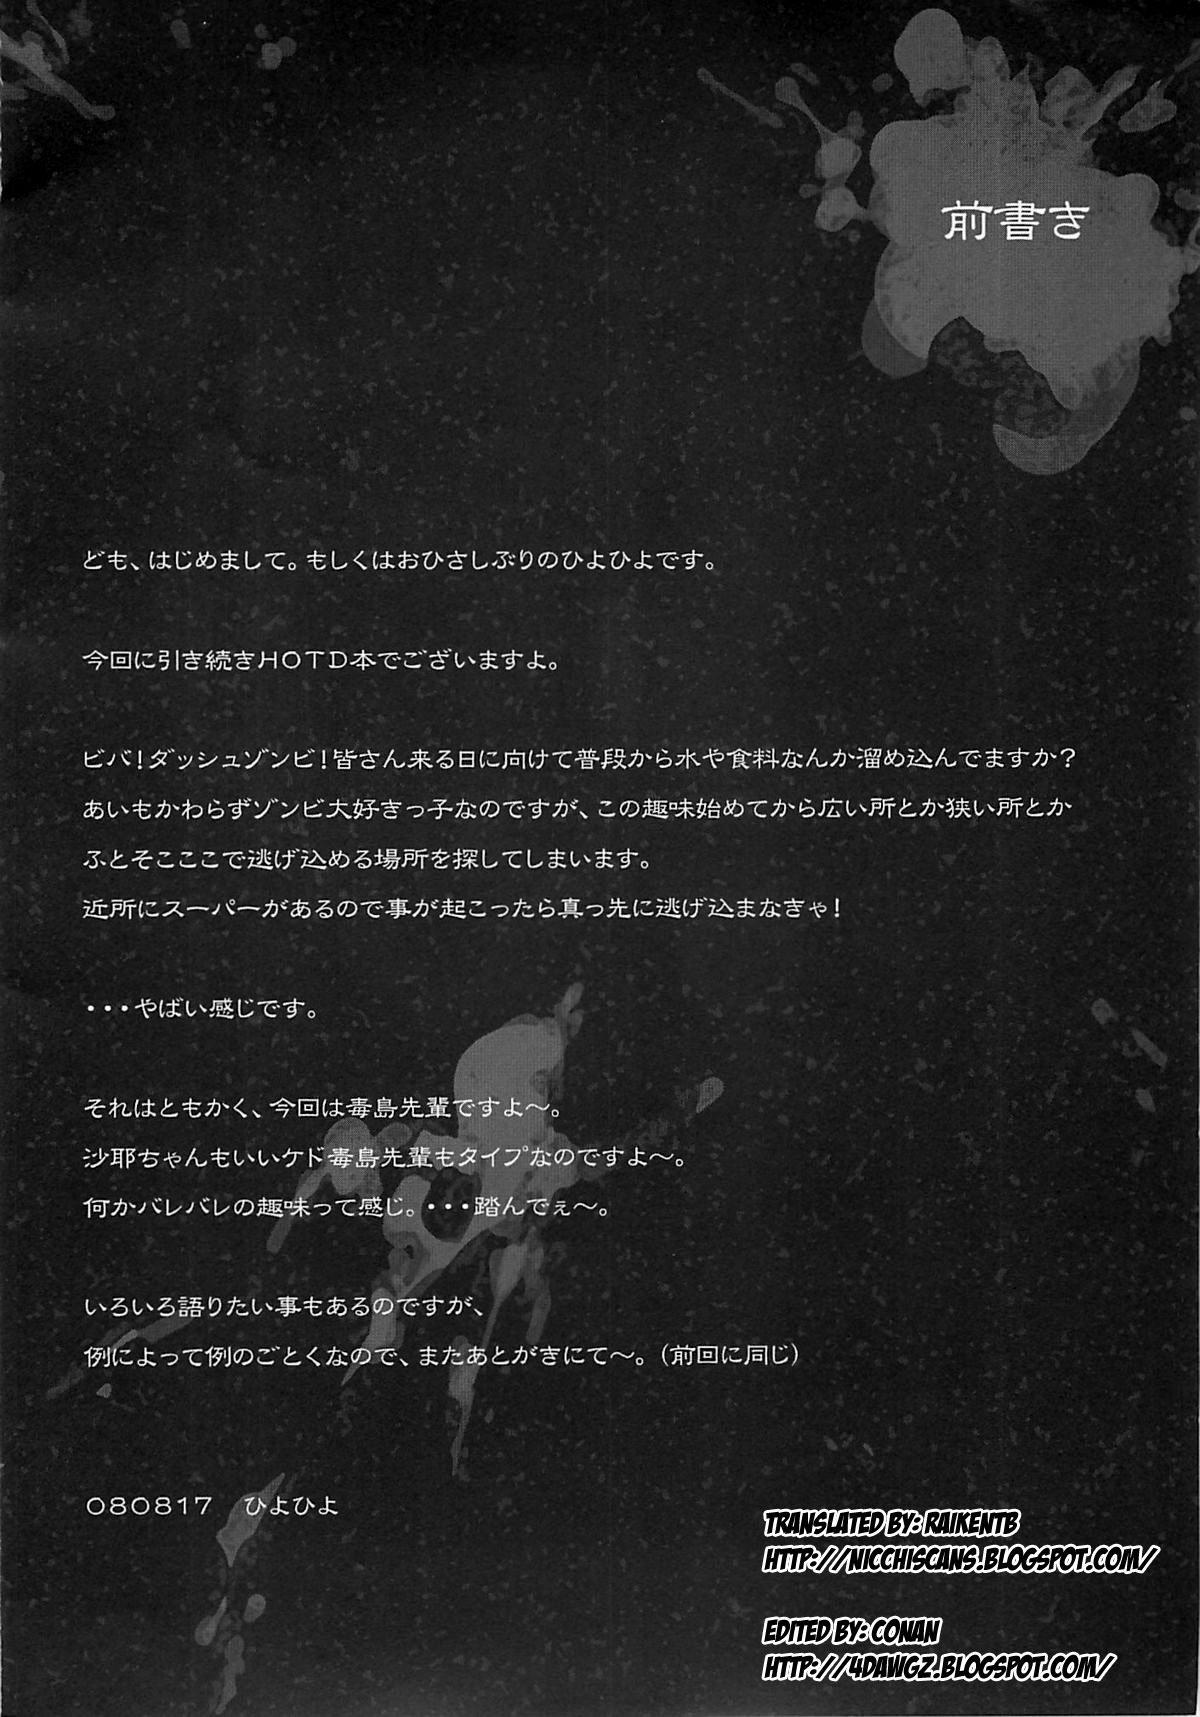 (C74) [Kashiwa-ya (Hiyo Hiyo)] D[O]HOTD2 D.O.D. (Gakuen Mokushiroku HIGHSCHOOL OF THE DEAD) [English] [Nicchi + 4dawgs] 3